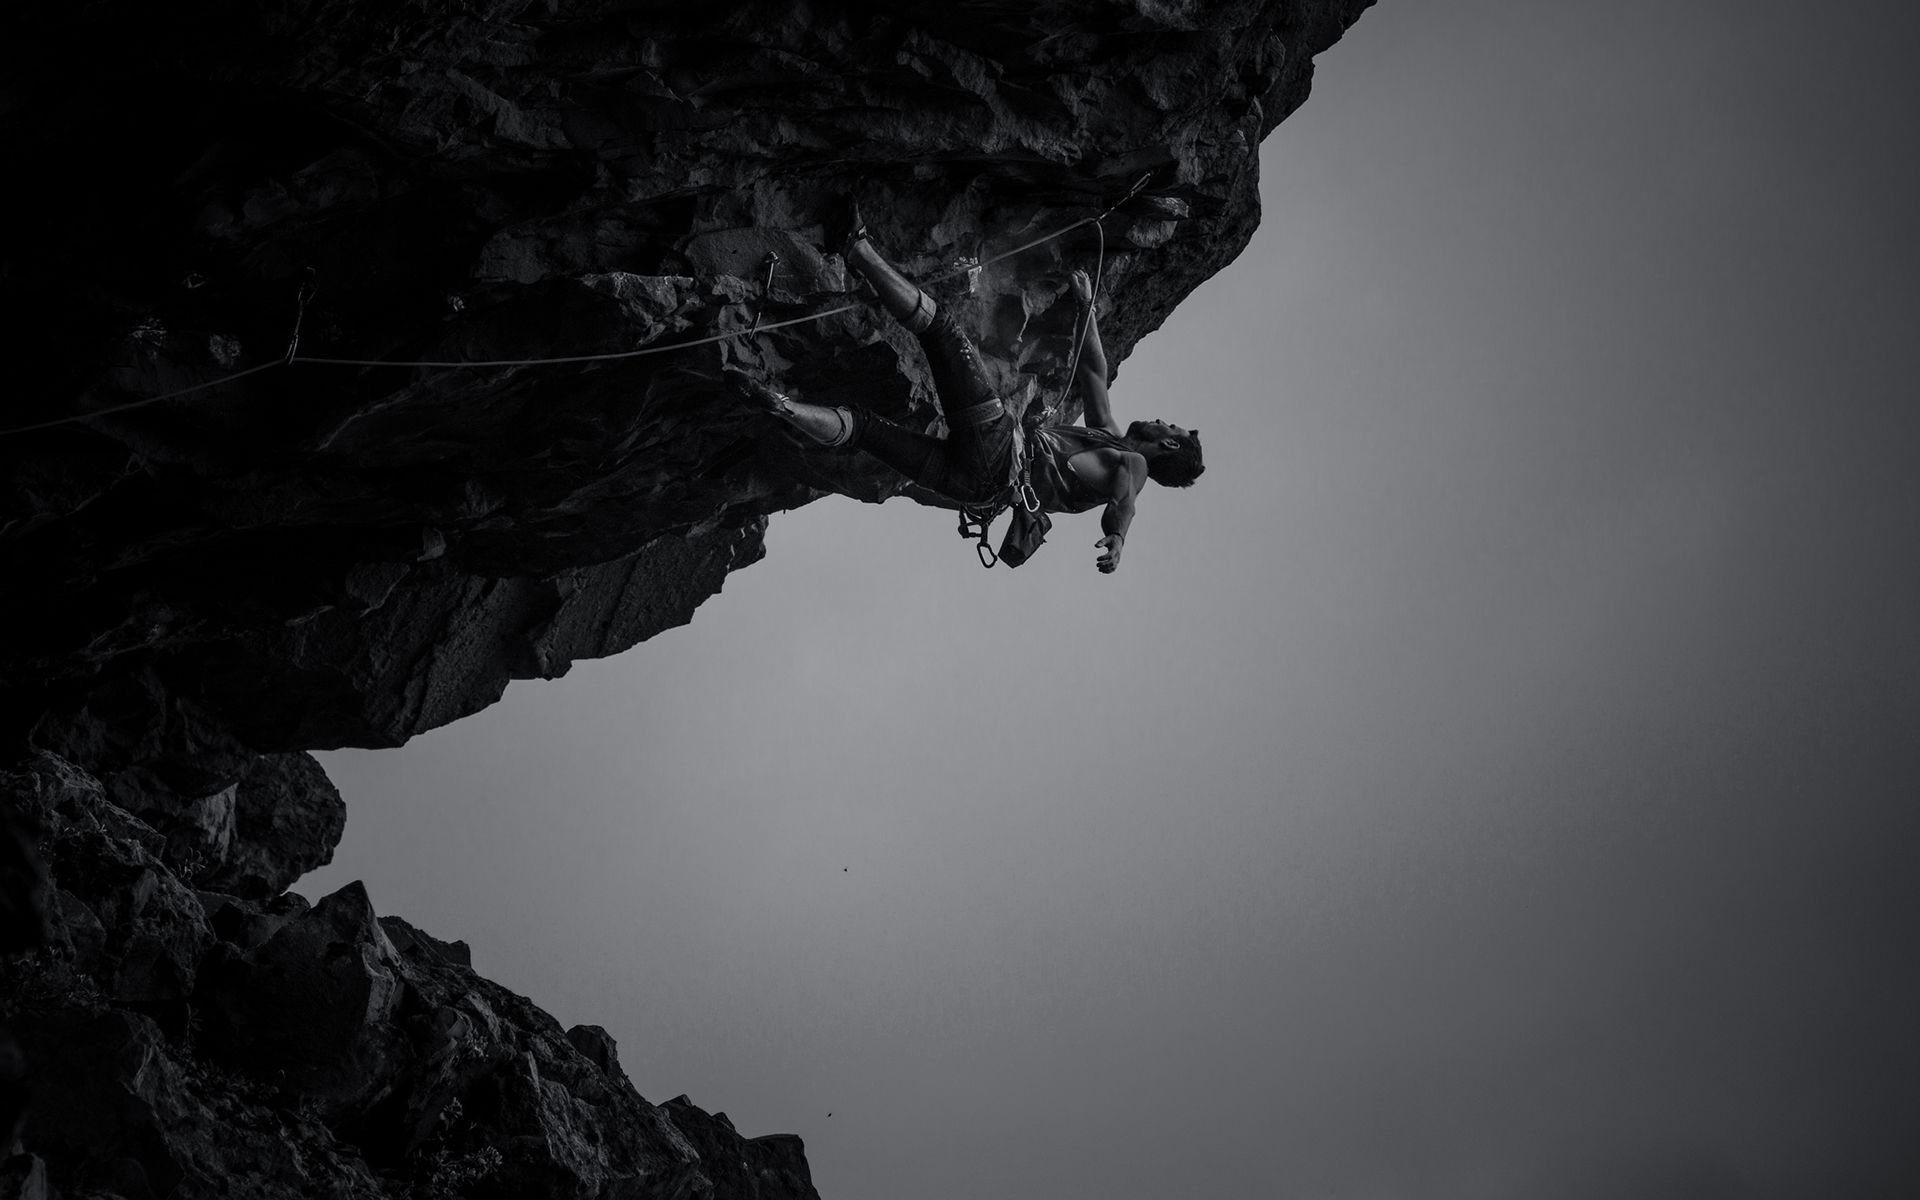 Monochrome Rock Climbing Wallpaper 56283